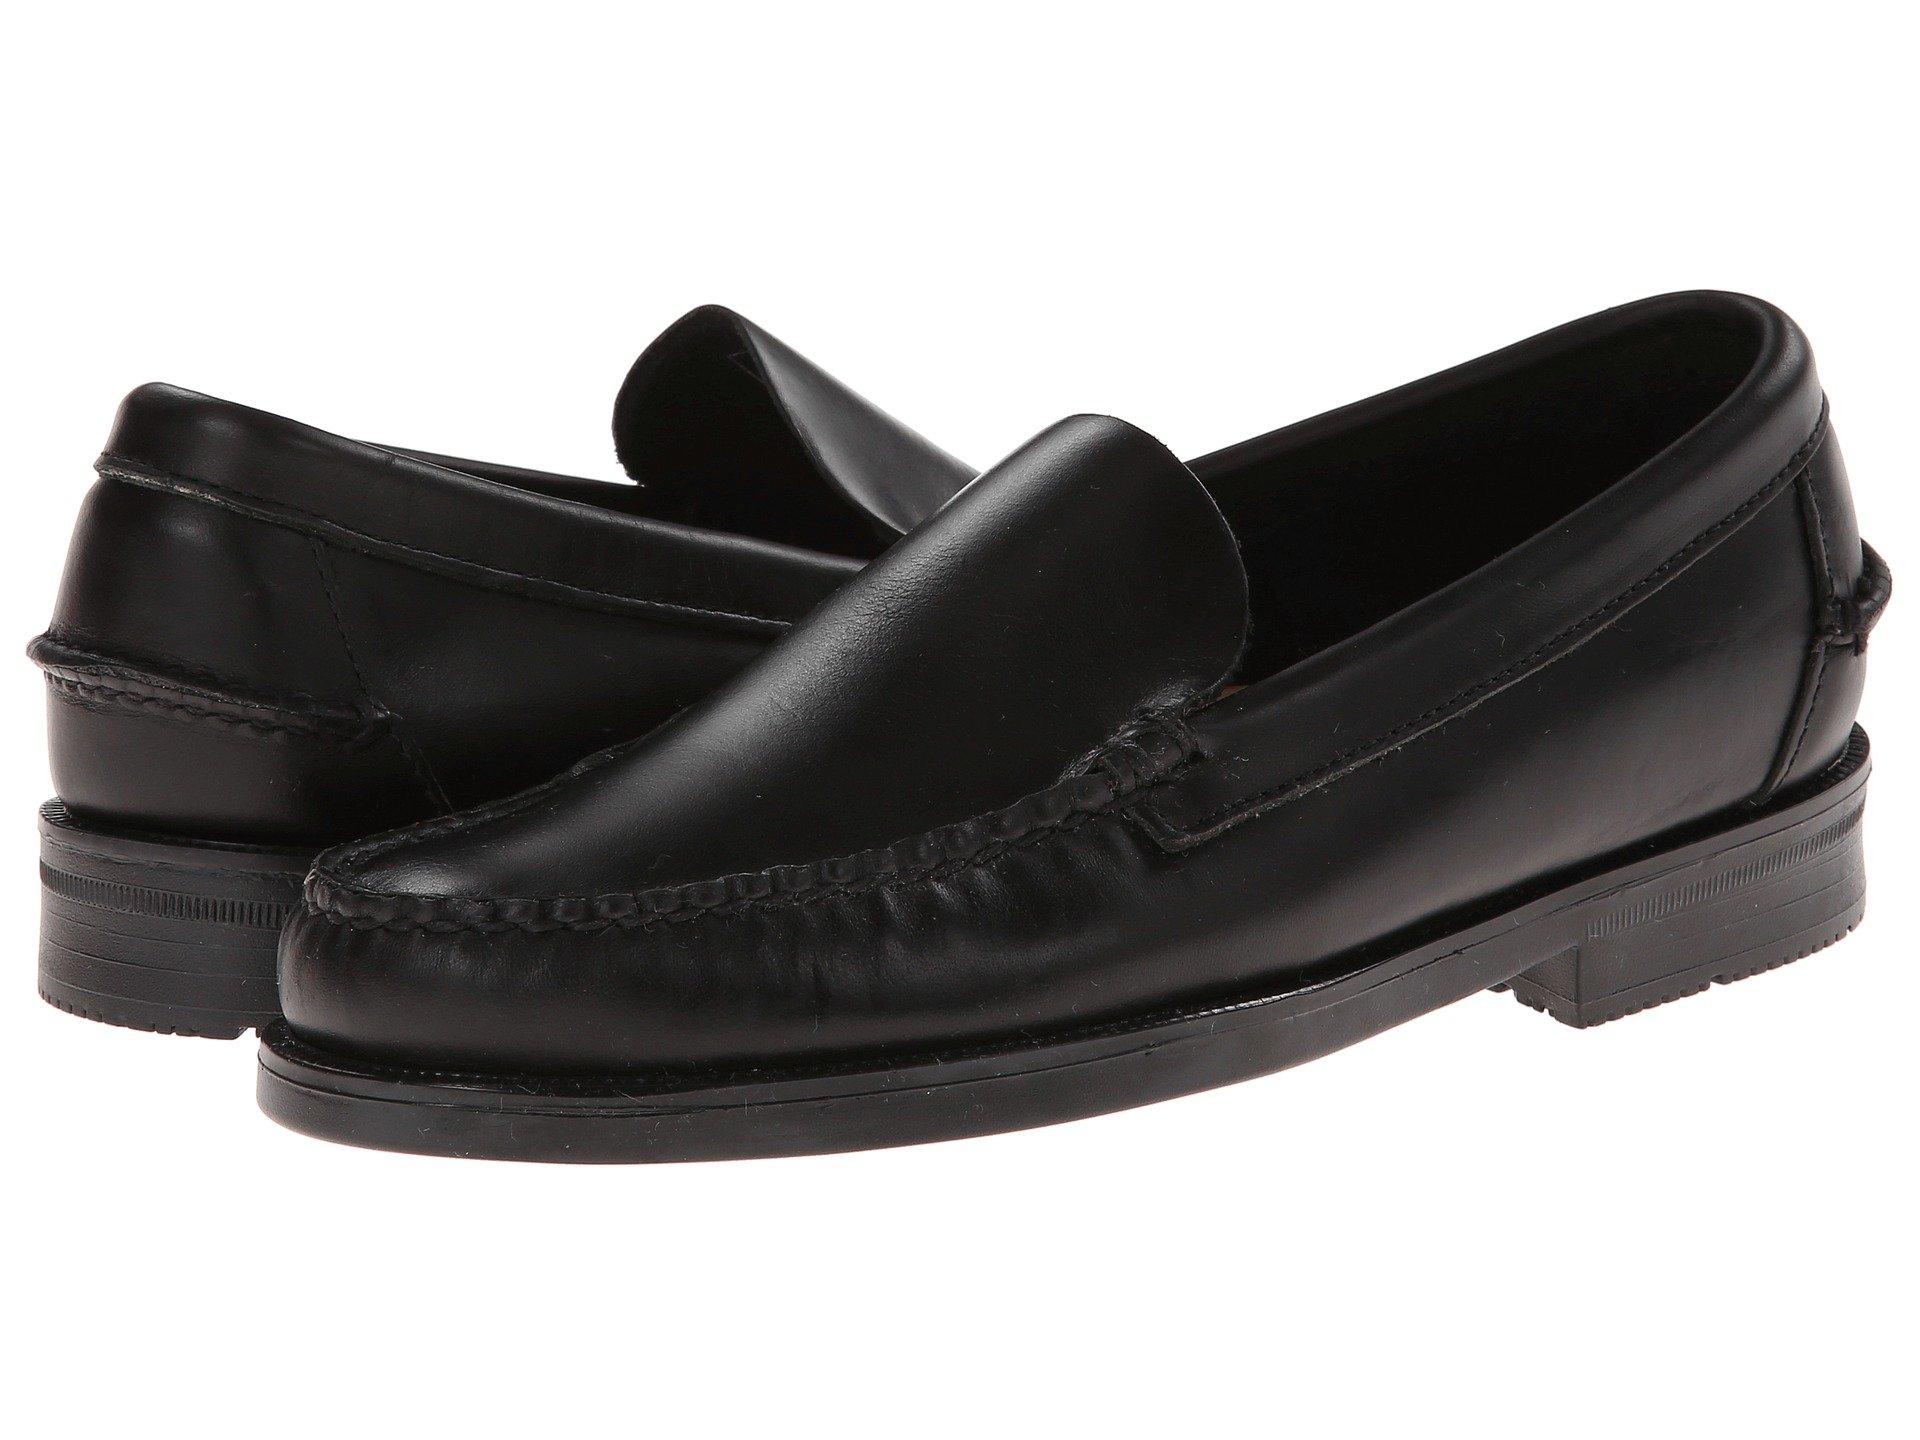 New Sebago Grant Venetian Men's Shoes, Black Leather